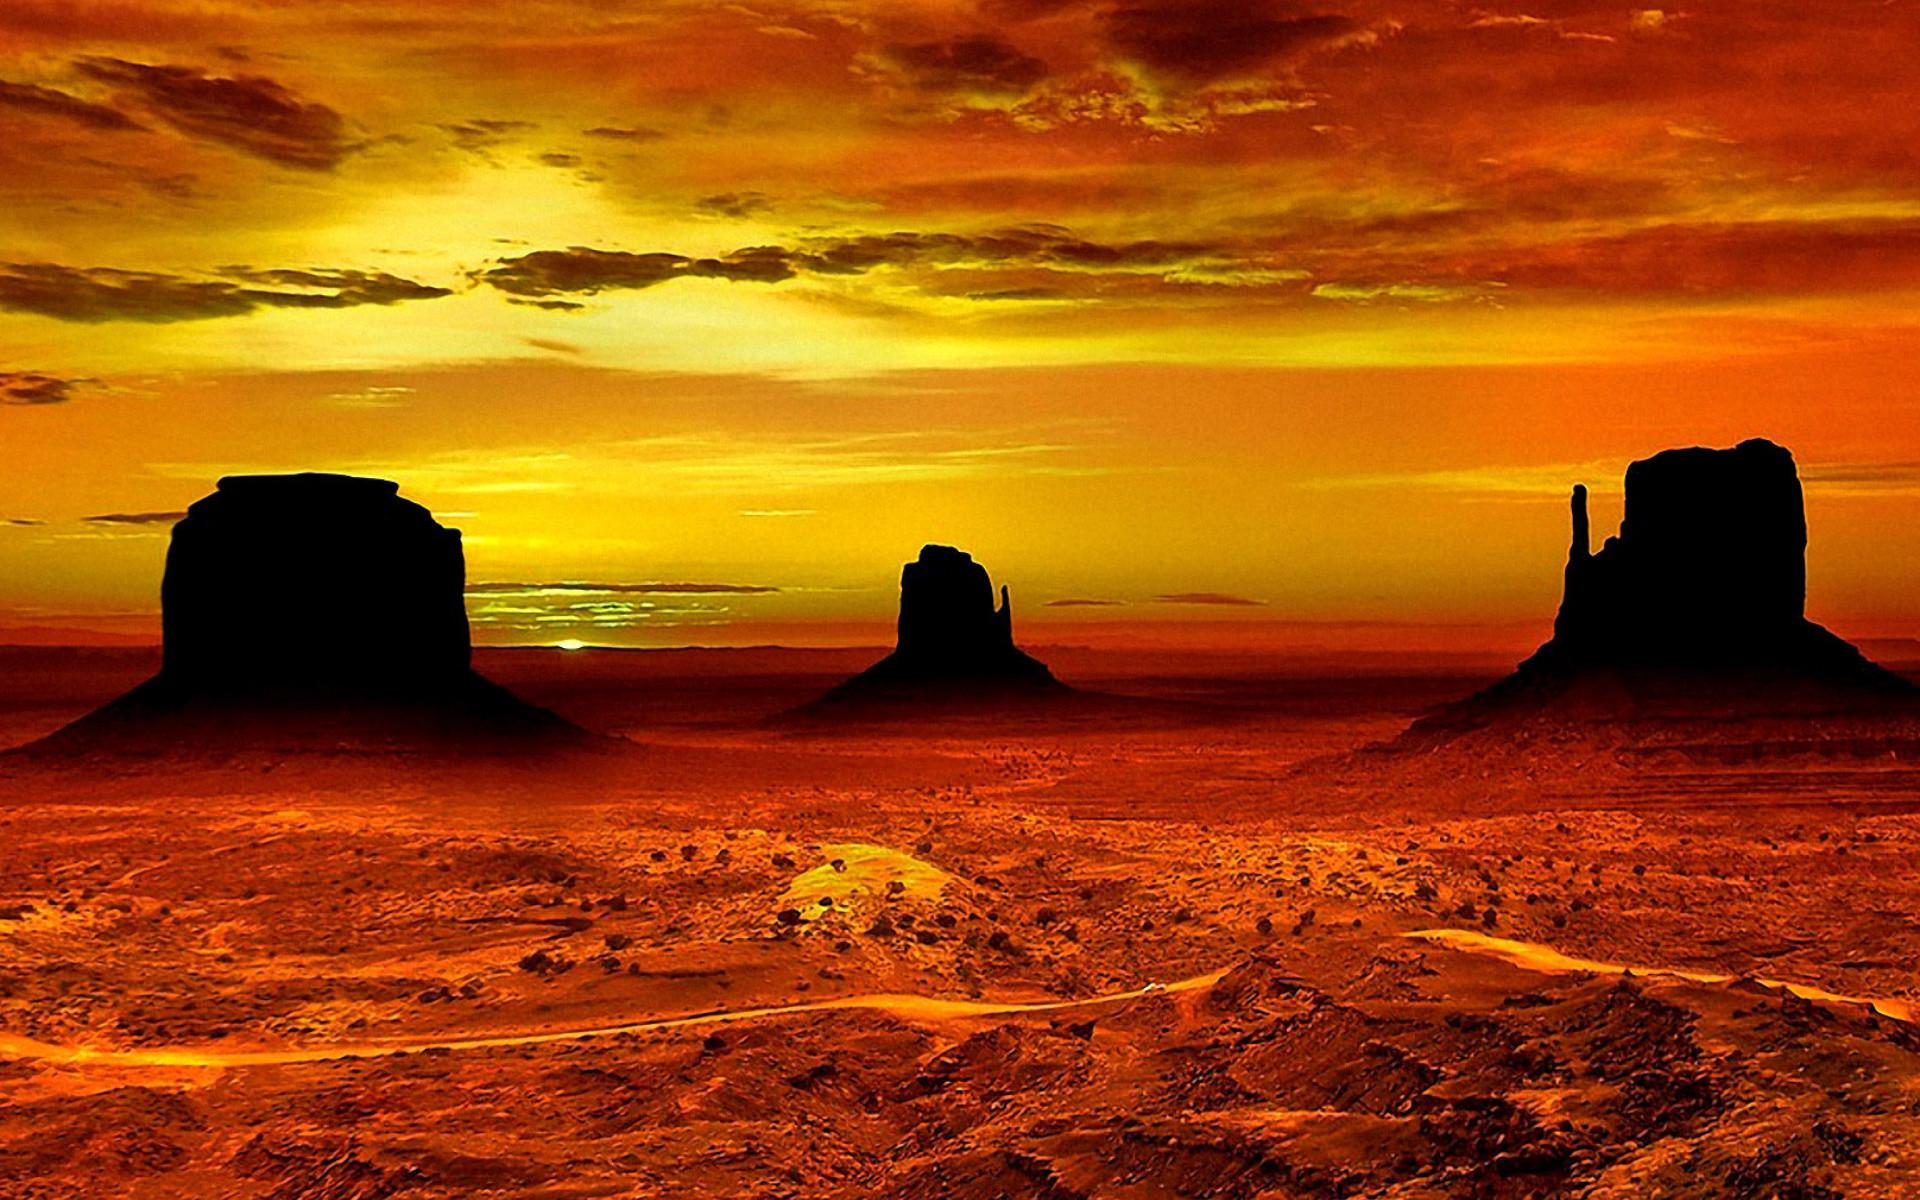 Desert Wallpapers for Widescreen Desktop PC 1920×1080 Full HD